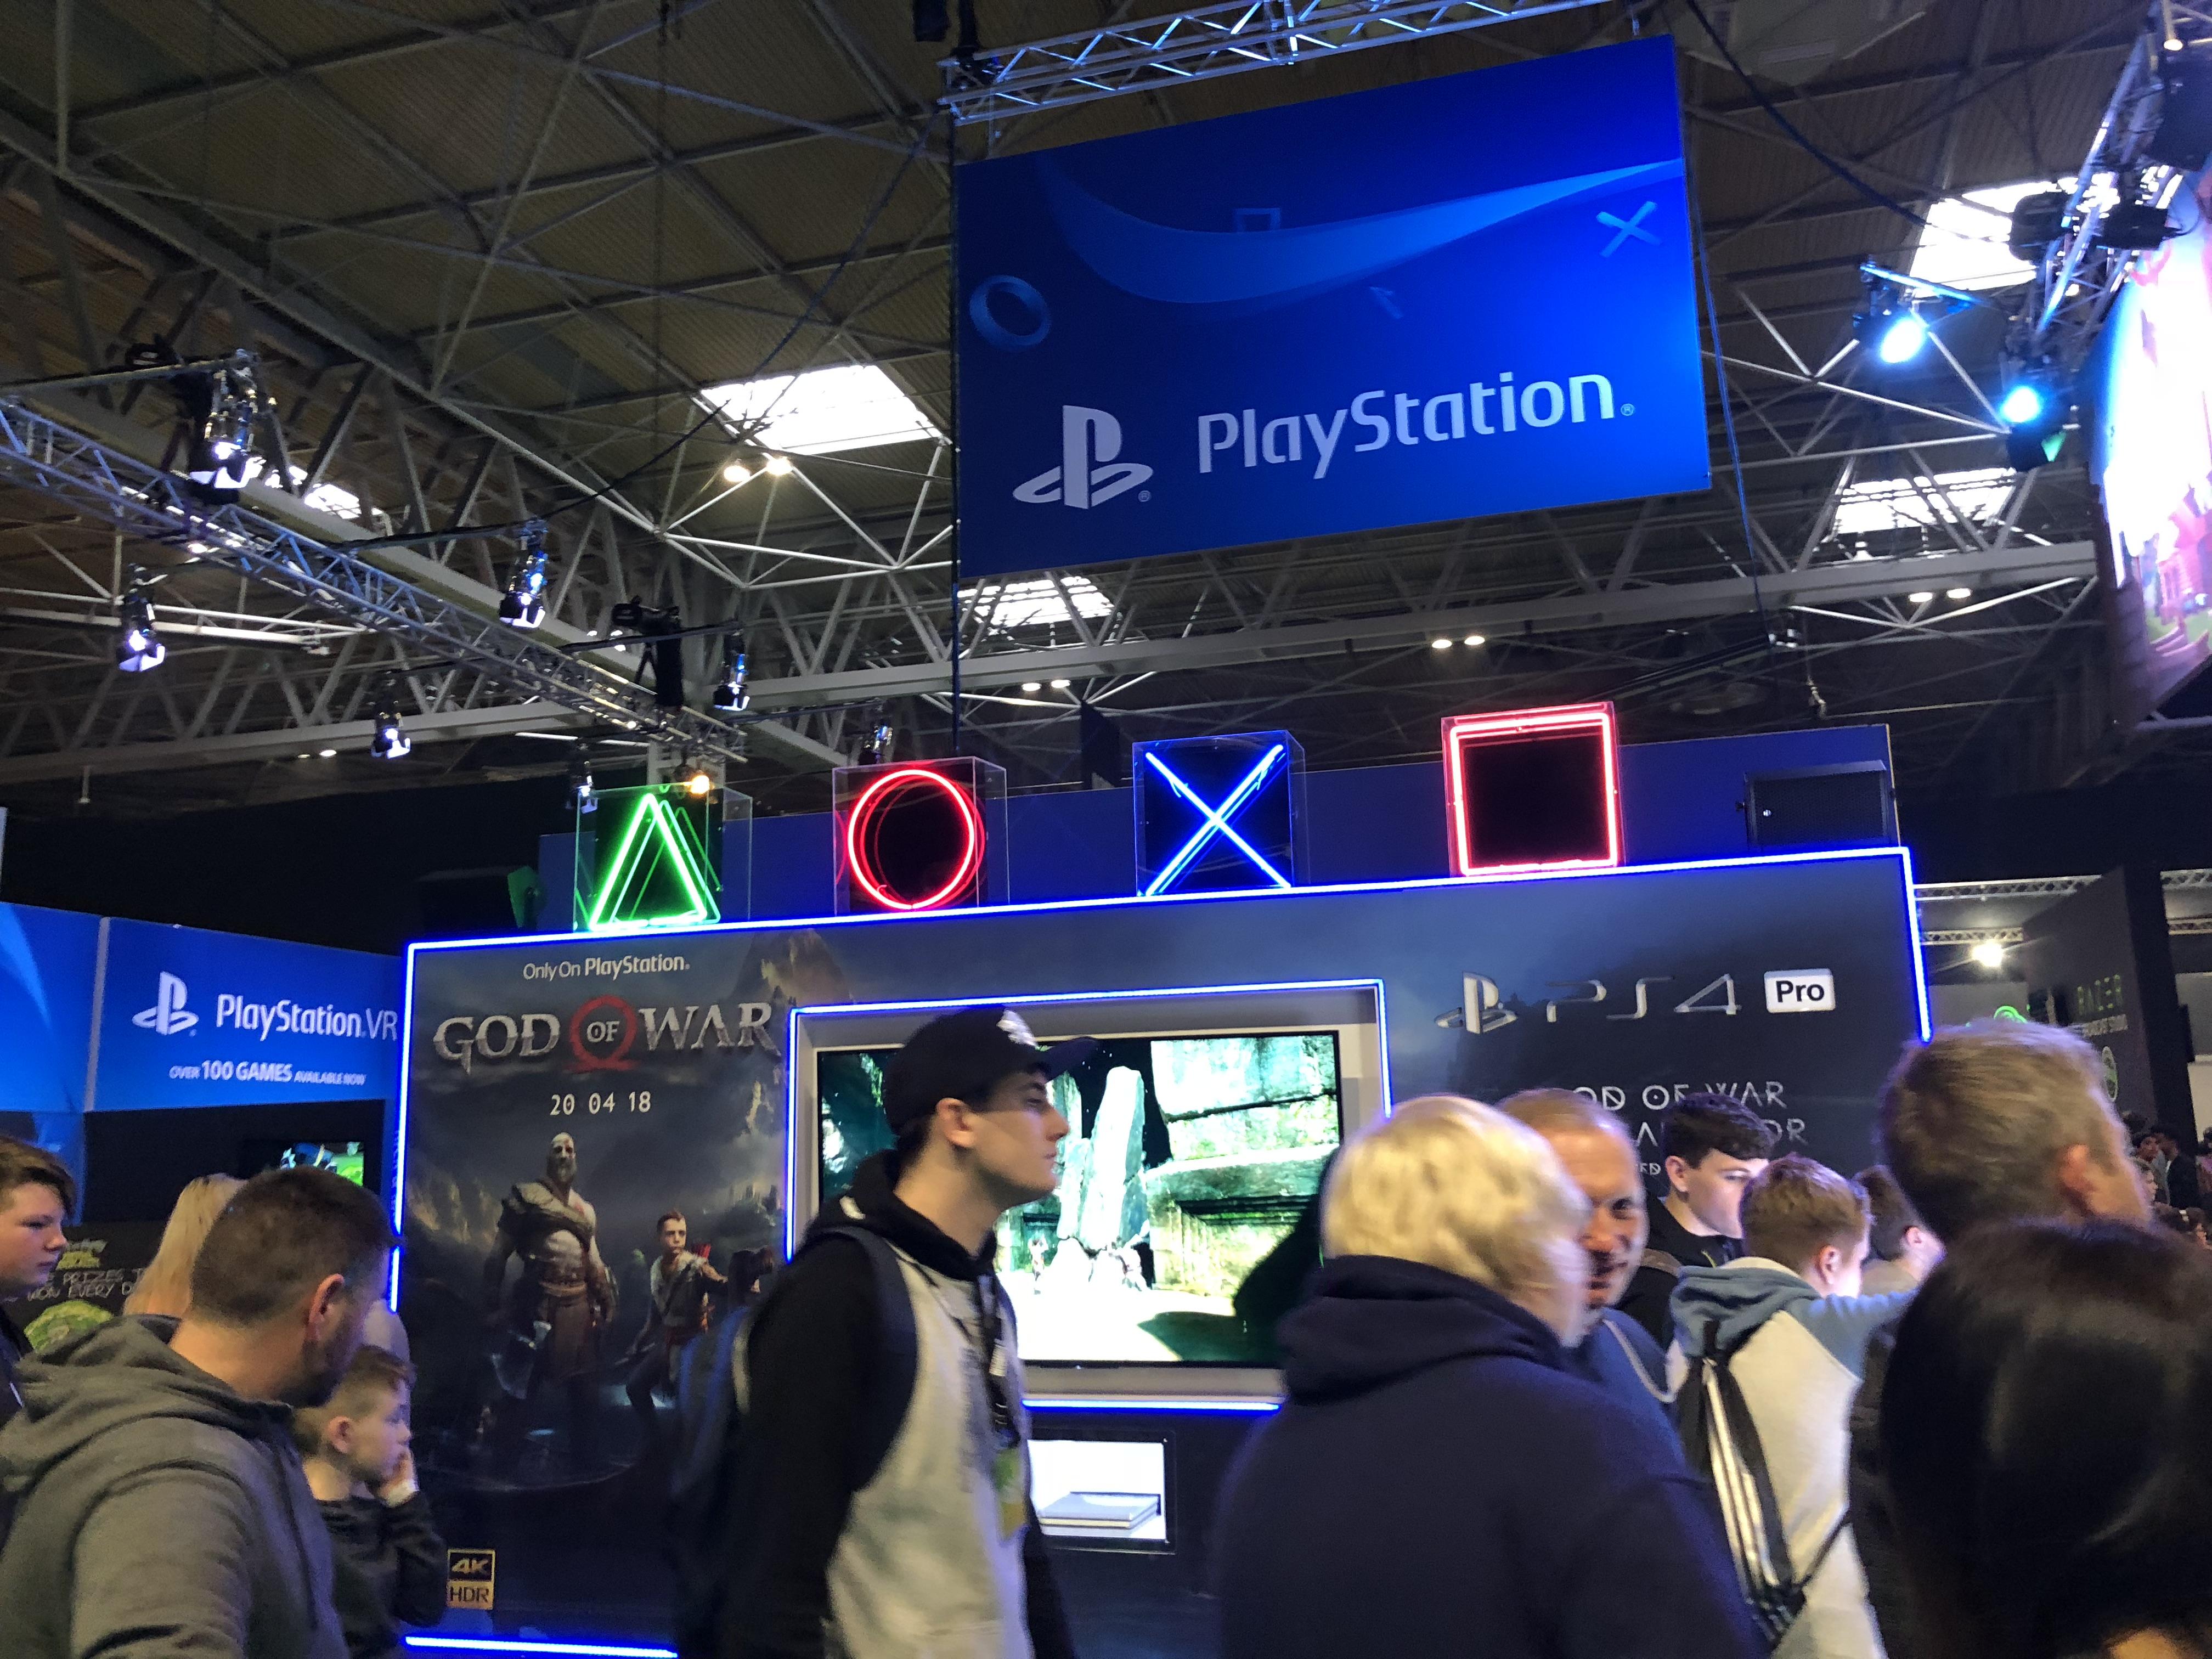 2018 Gaming Events Roundup - RockstarINTEL